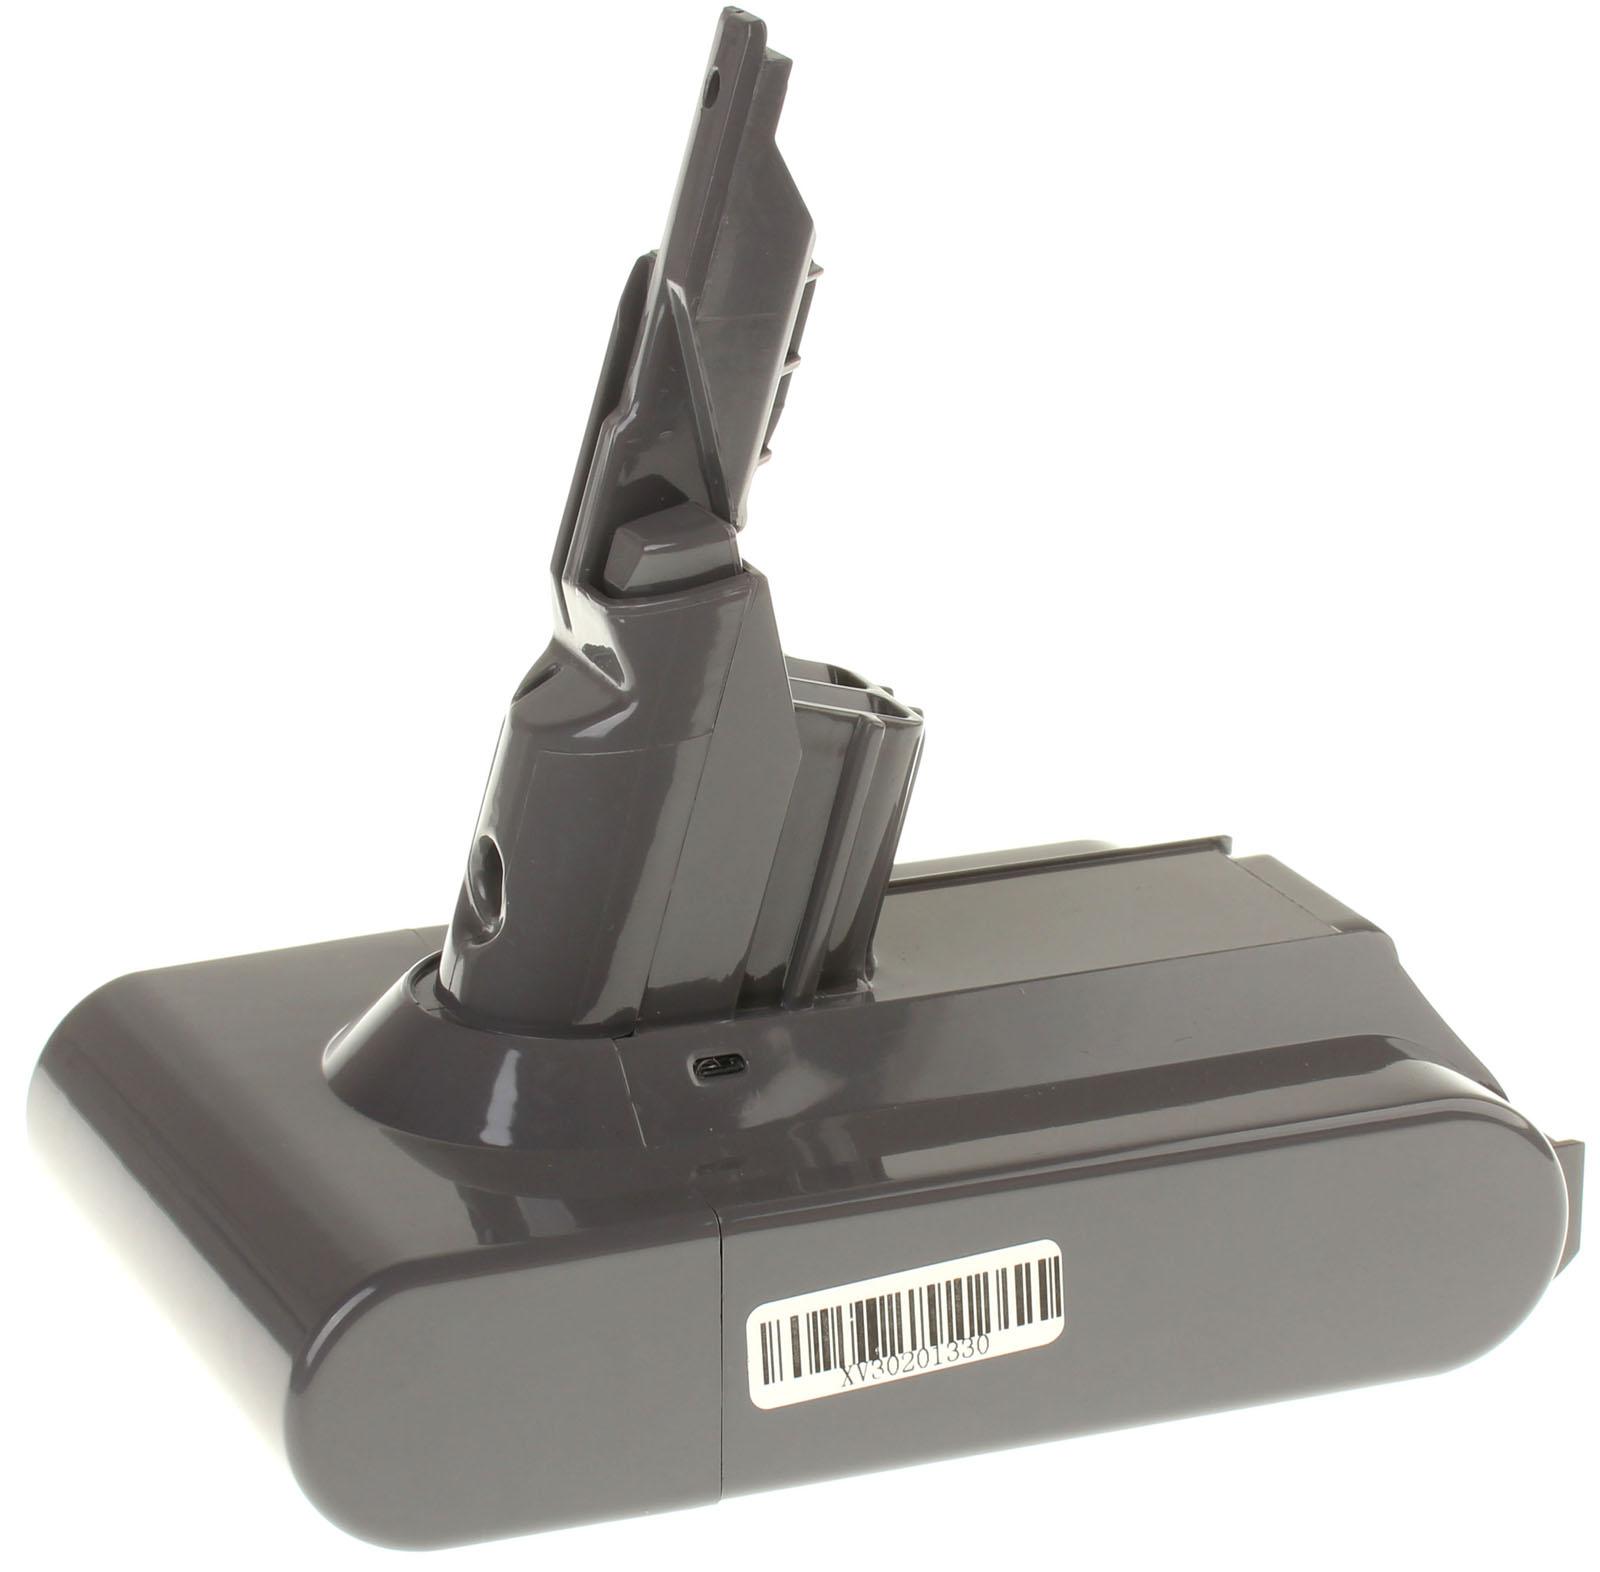 Аккумулятор для пылесоса дайсон 65 dyson фен фото